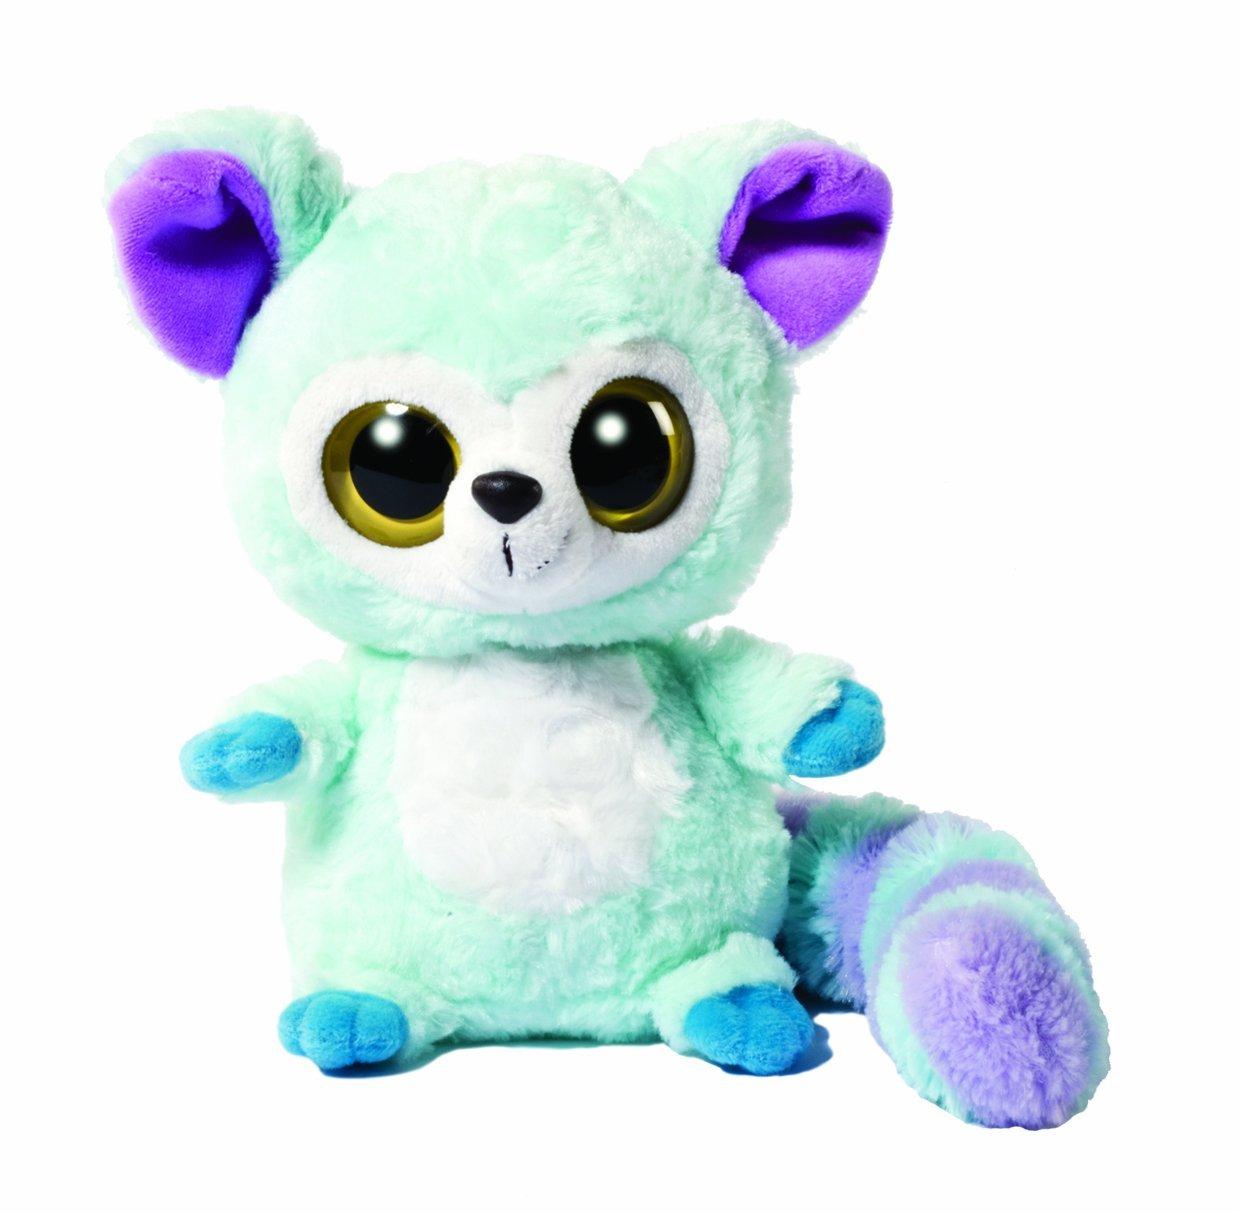 YooHoo and Friends Tassier - Muñeco de peluche (13 cm aprox.)